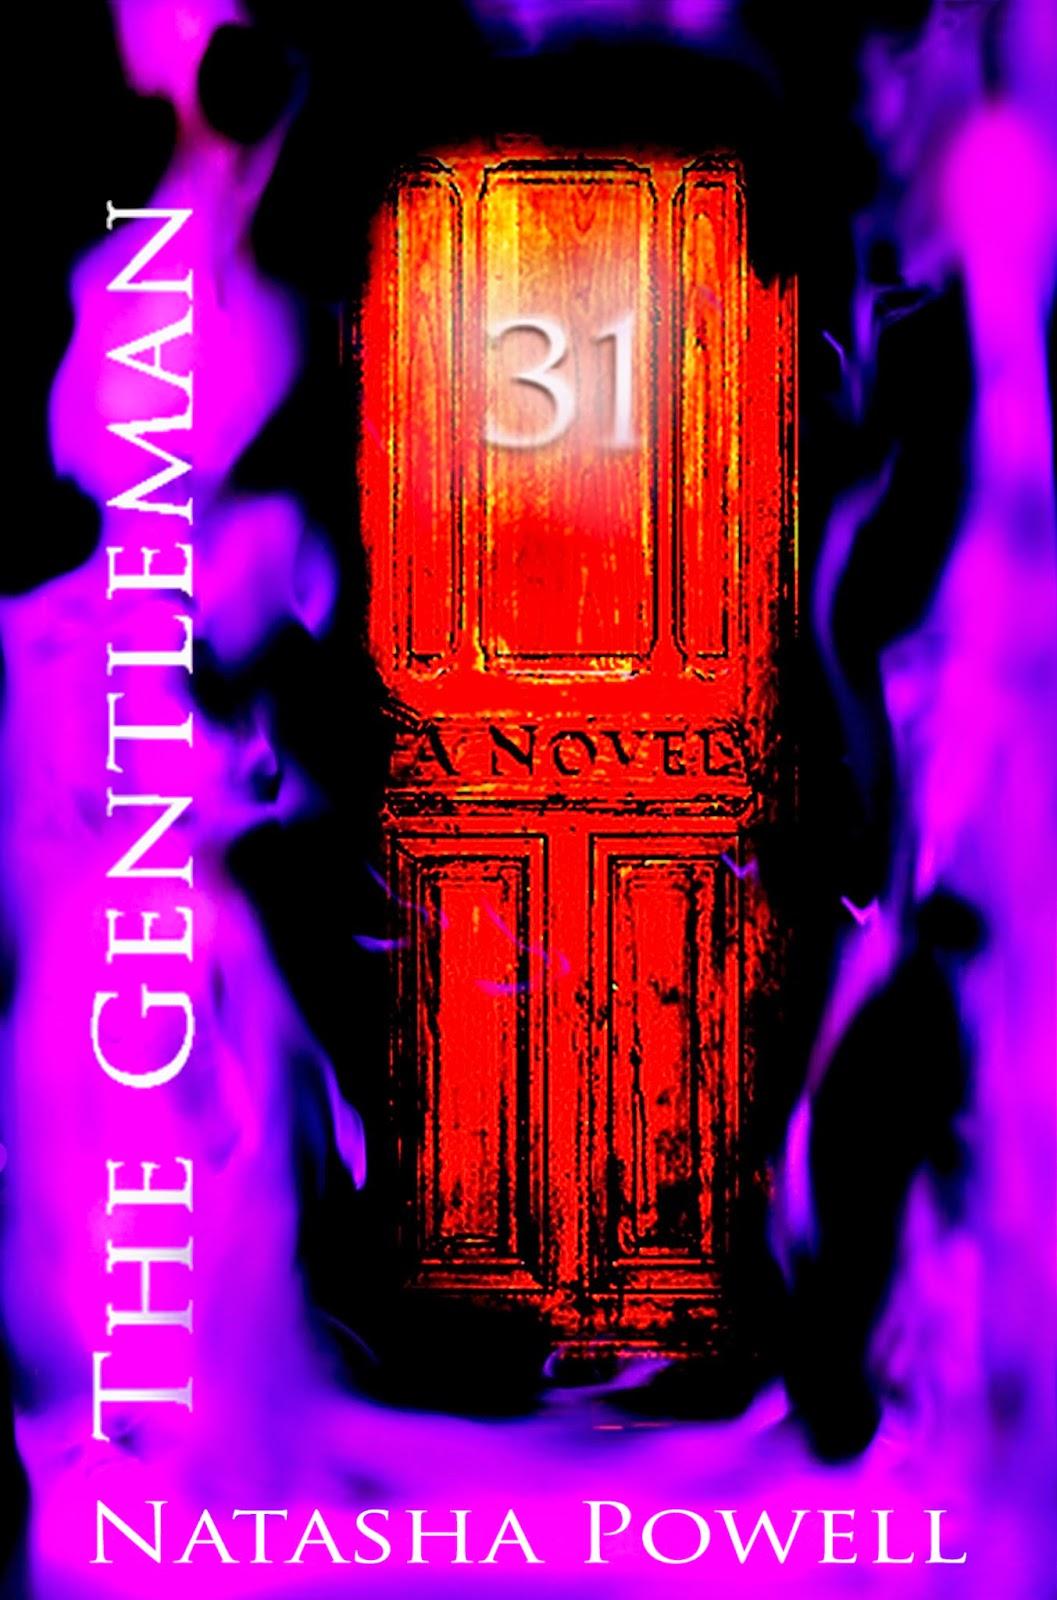 http://www.amazon.com/Gentleman-Natasha-Powell-ebook/dp/B00JQC0FDK/ref=sr_1_1?s=digital-text&ie=UTF8&qid=1398278844&sr=1-1&keywords=the+gentleman